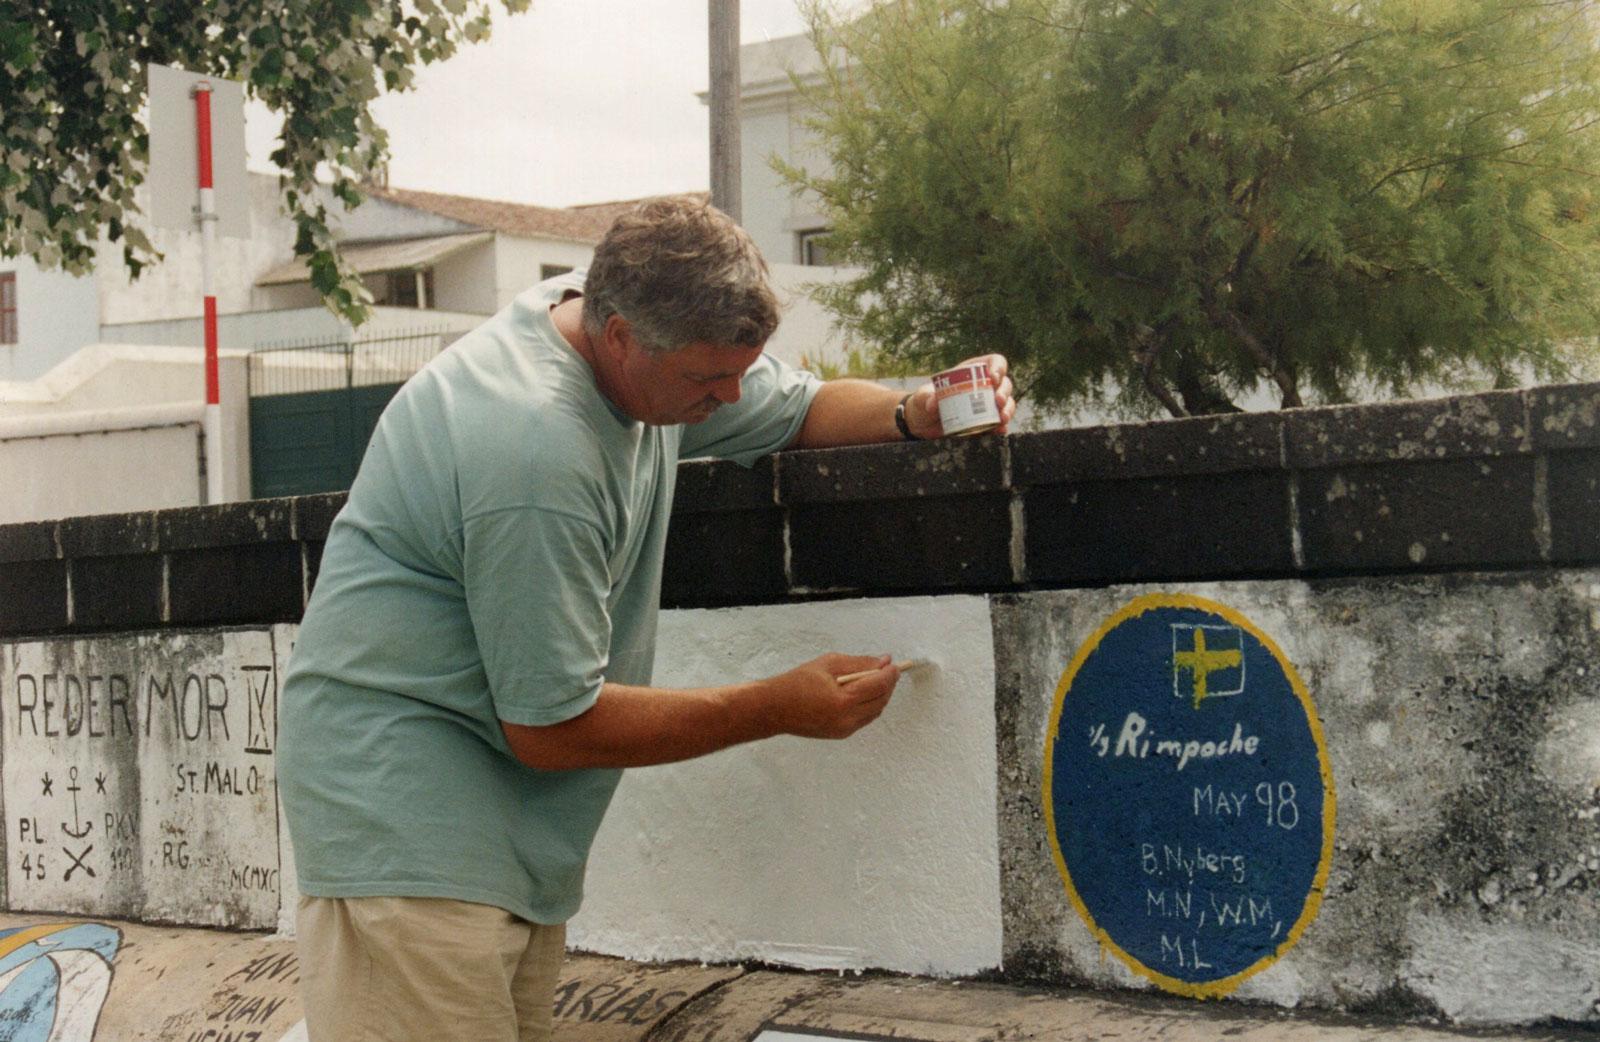 Painting cruising badge 1998